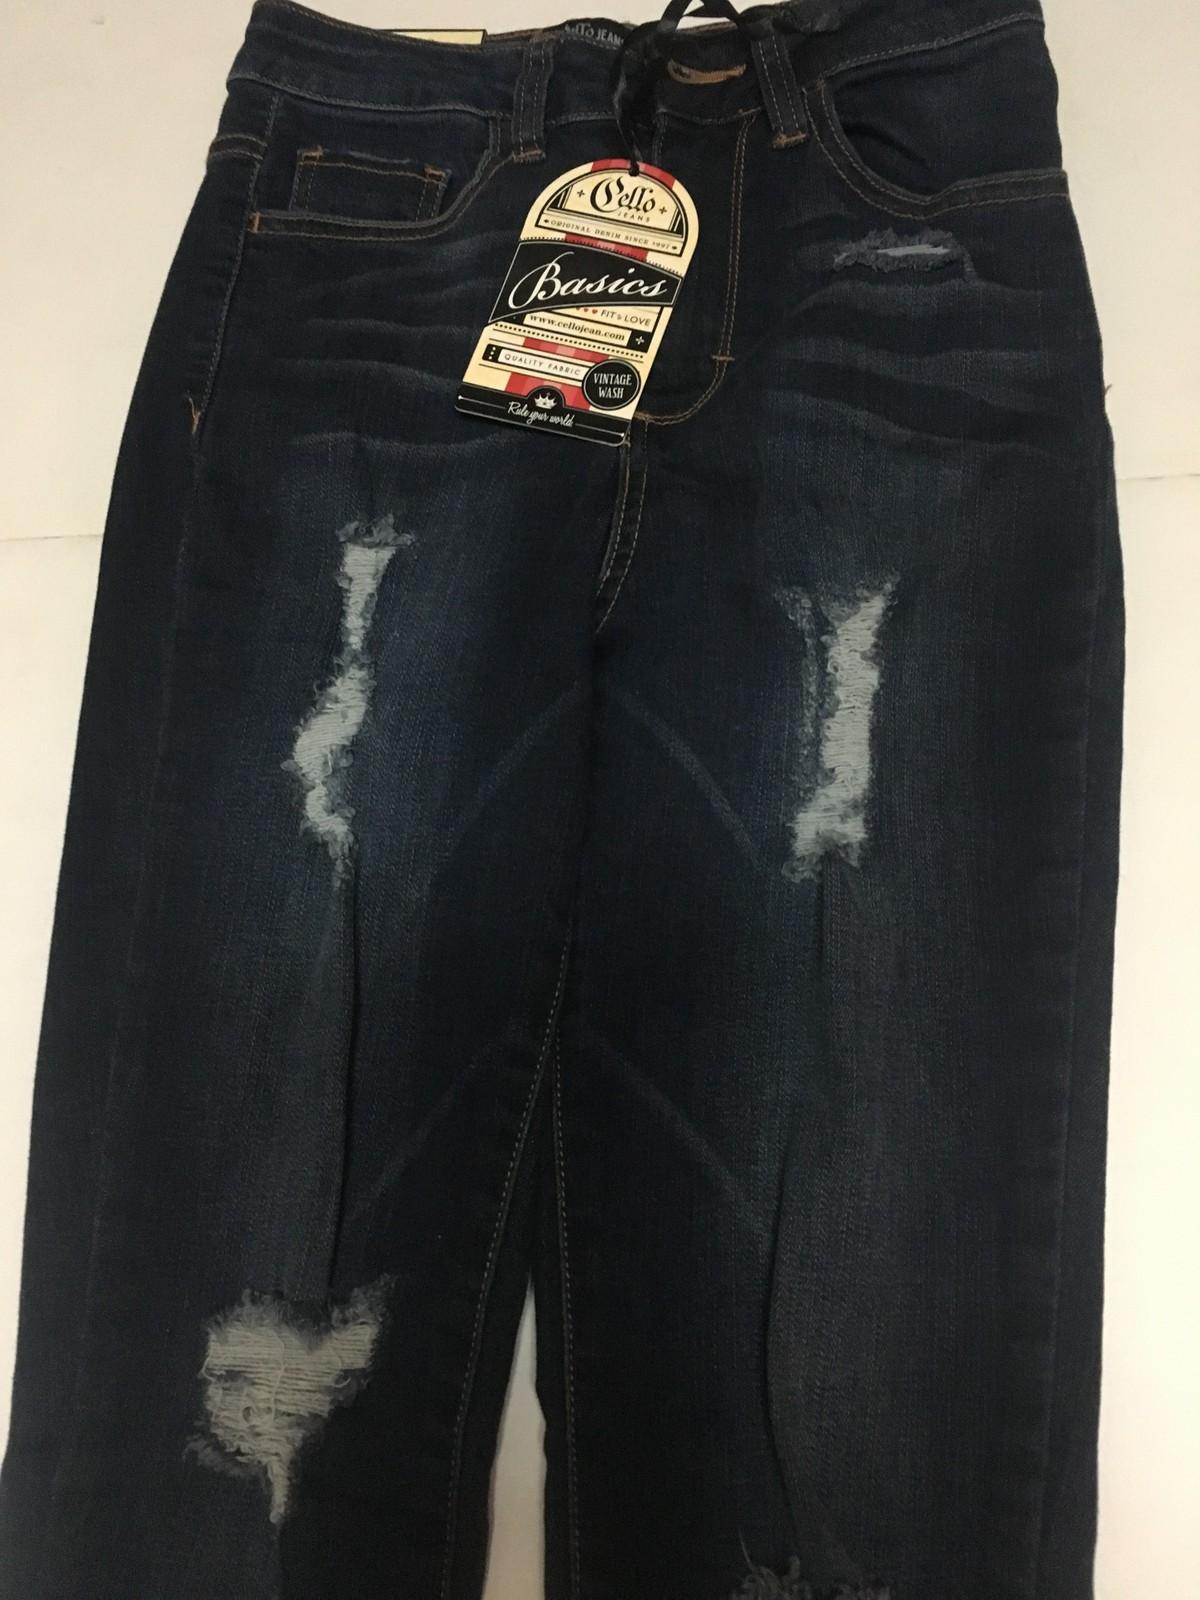 "Girls Skinny Blue Jeans Cello Jeans Juniors Sz 3 Distressed Waist 24"""